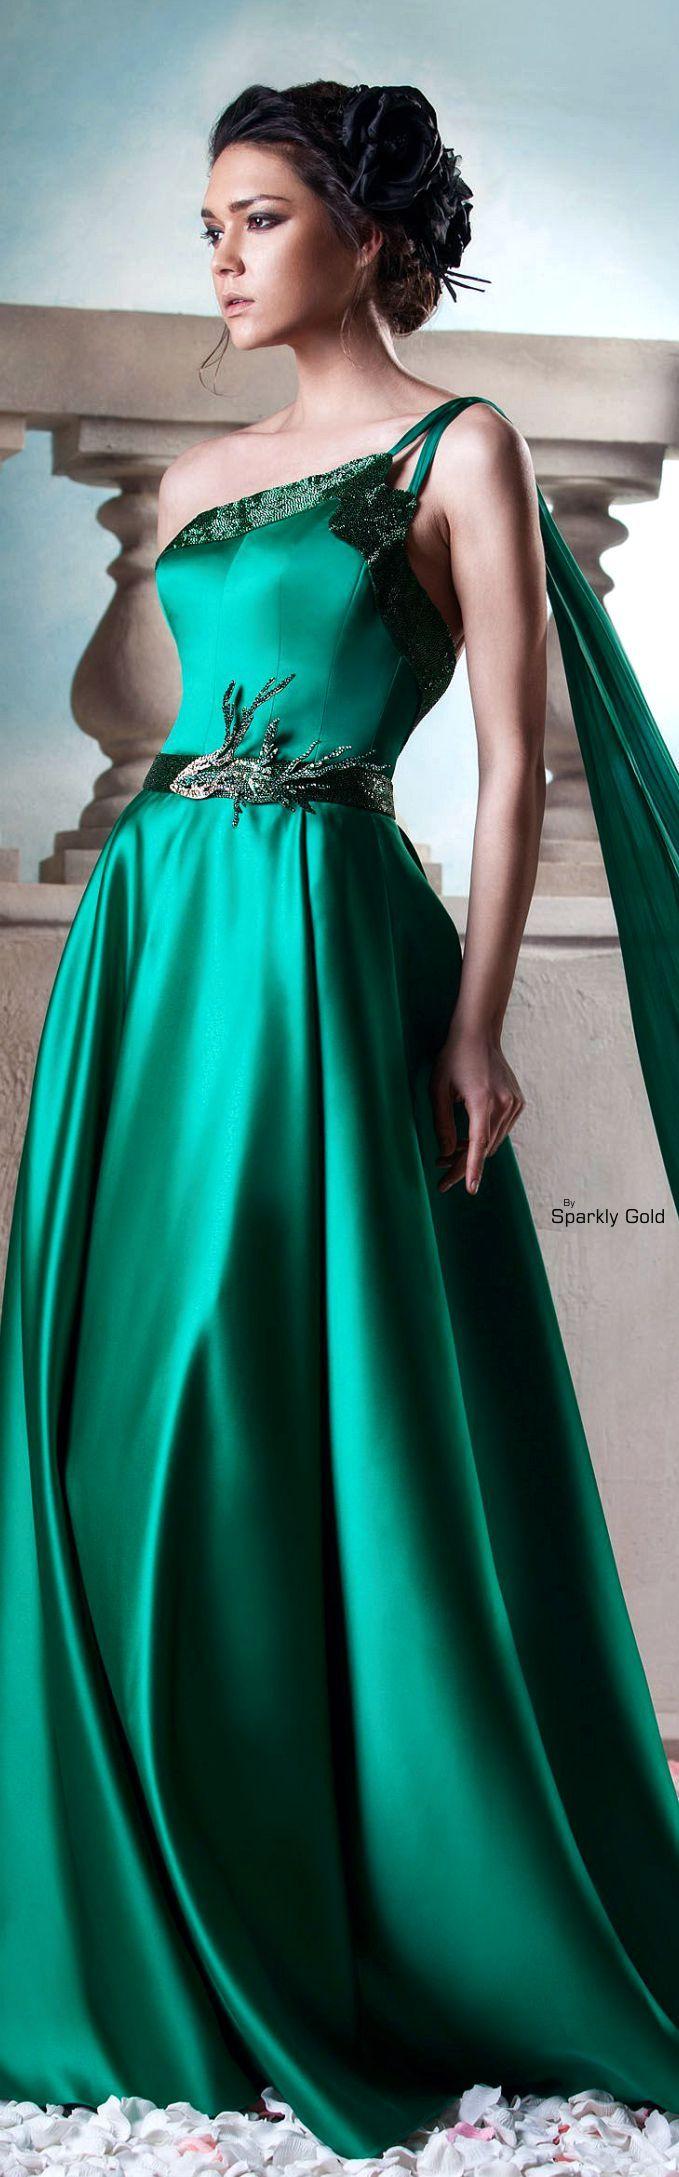 809 best vestidos images on Pinterest | Formal prom dresses, Night ...